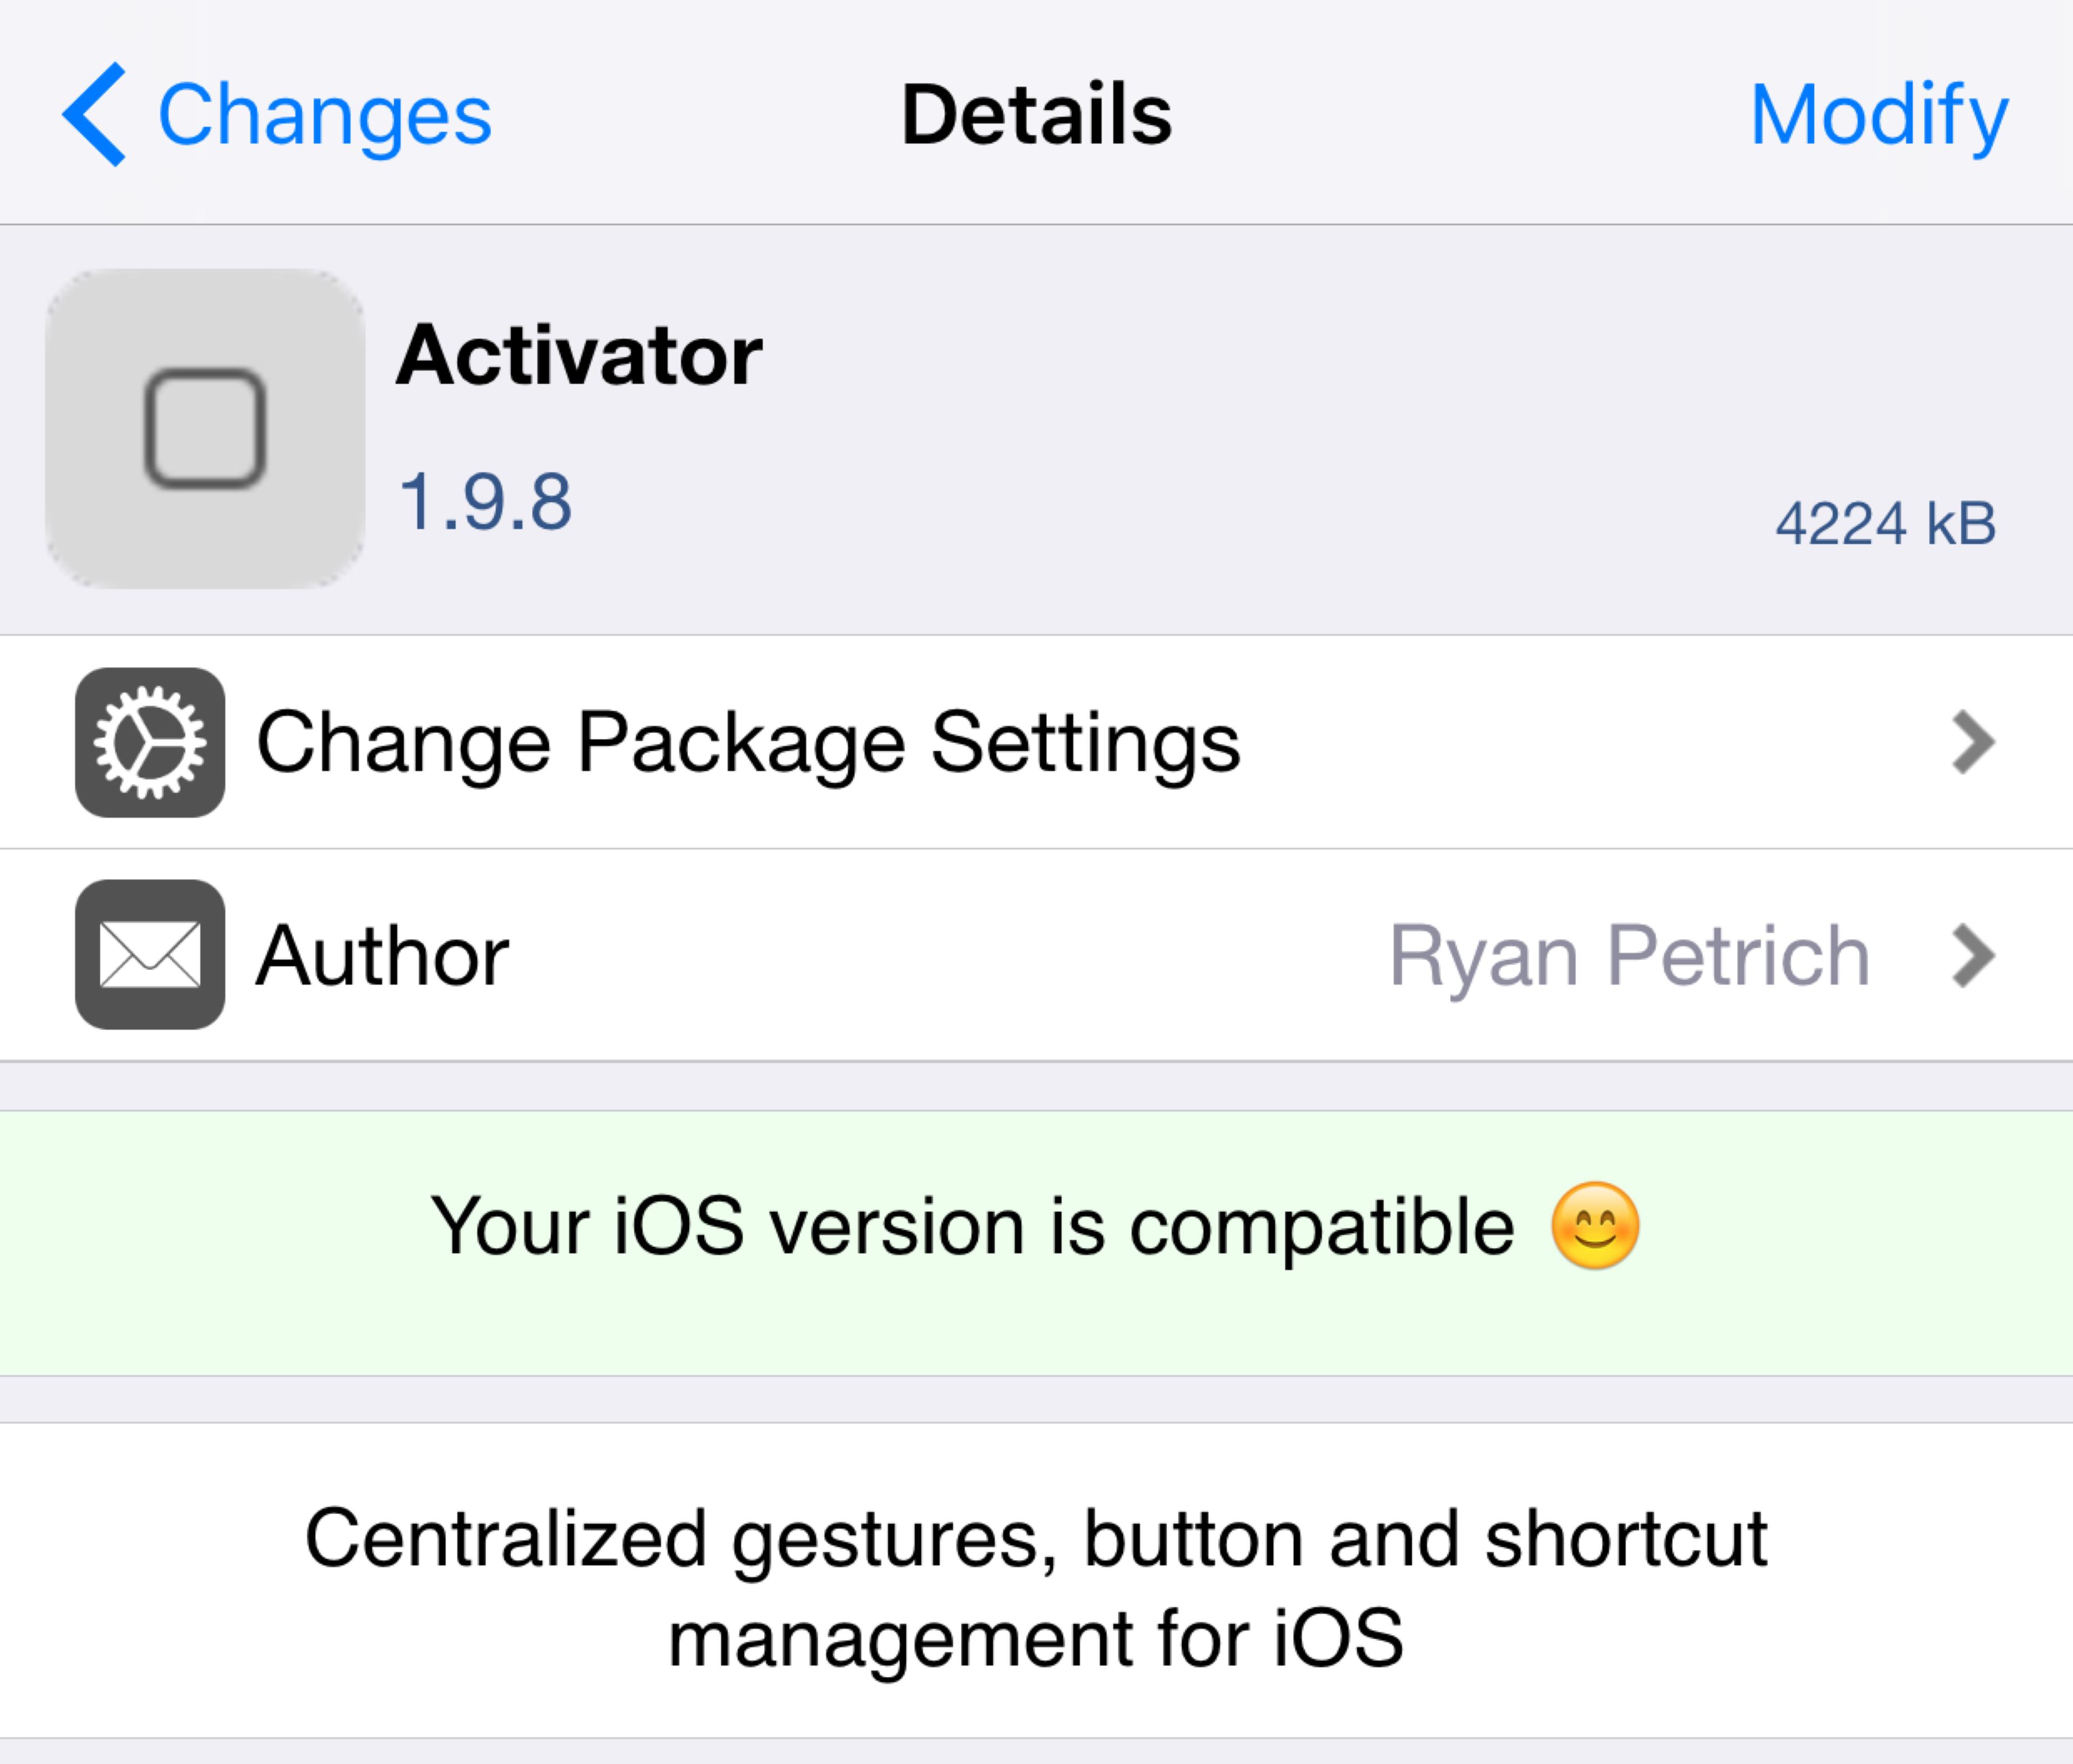 Activator 1.9.8